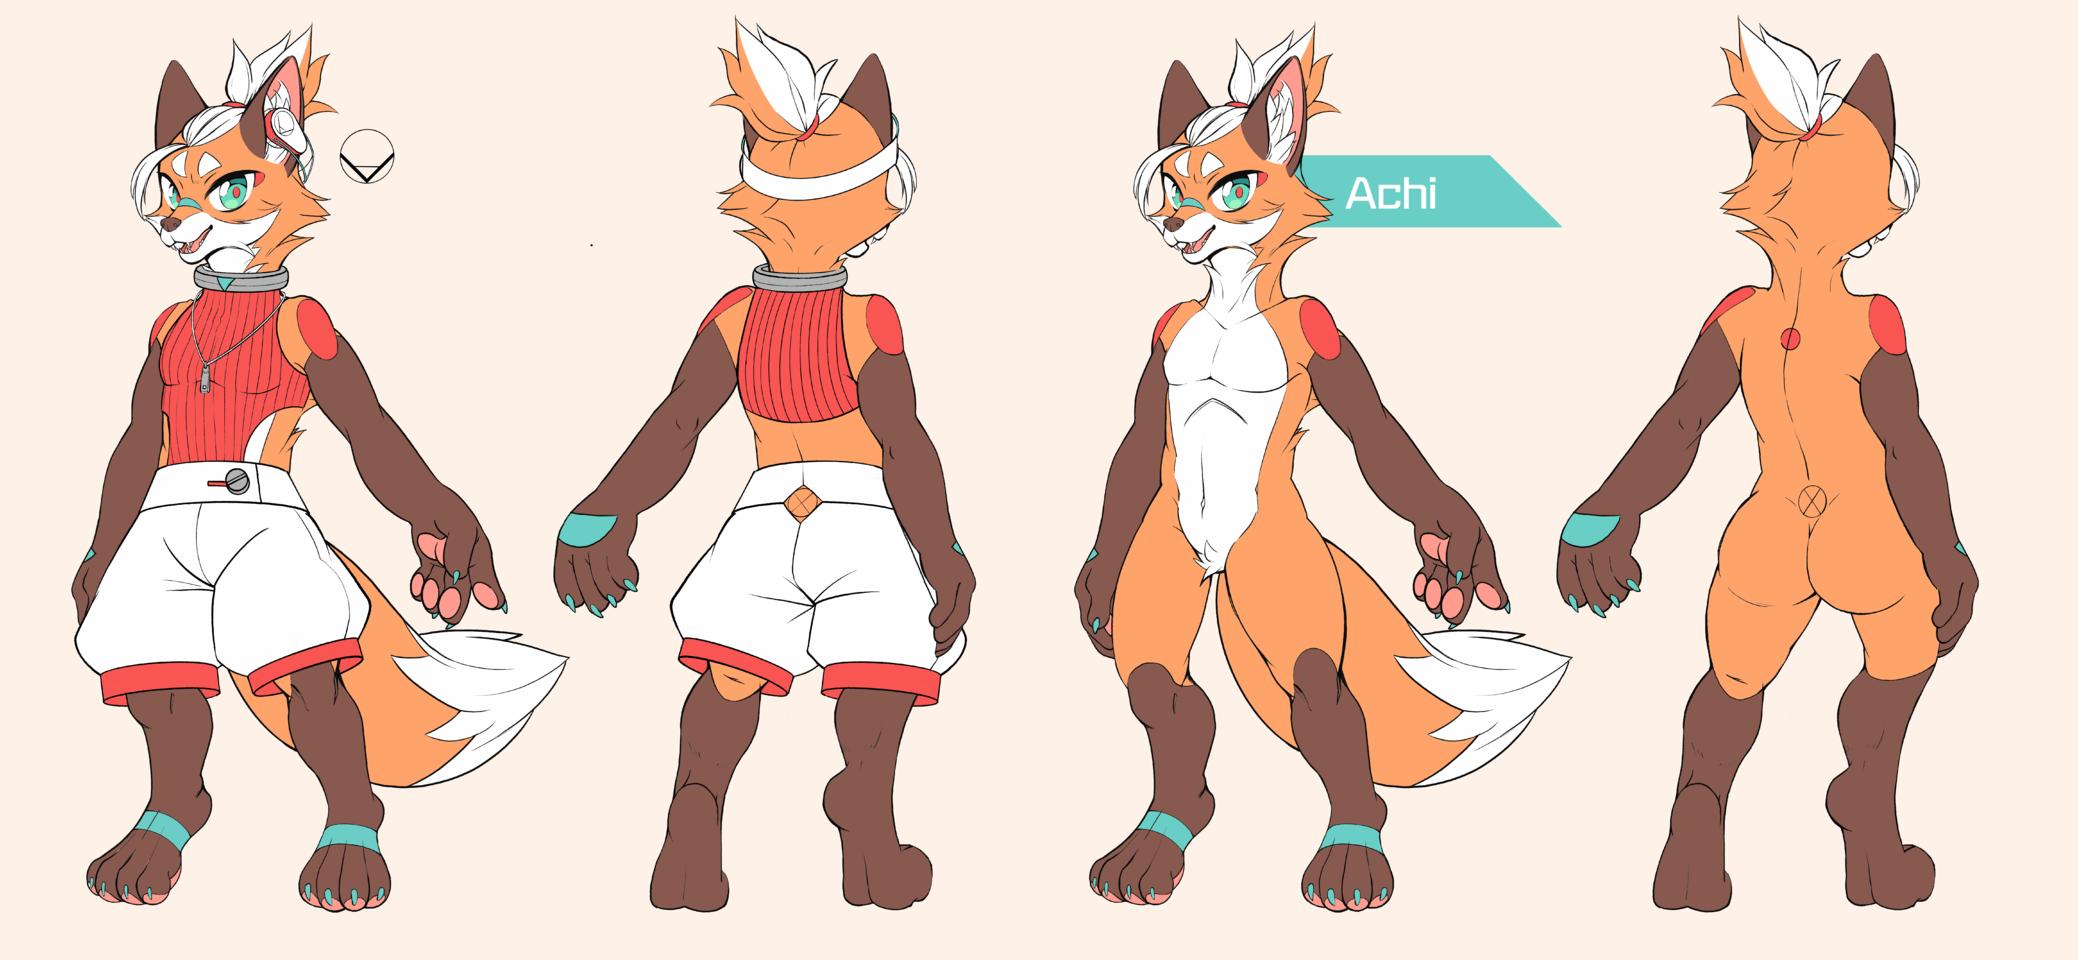 New Ref Sheet Illust of Achi September2020_Contest:Furry fox furry neon fursona furryoc